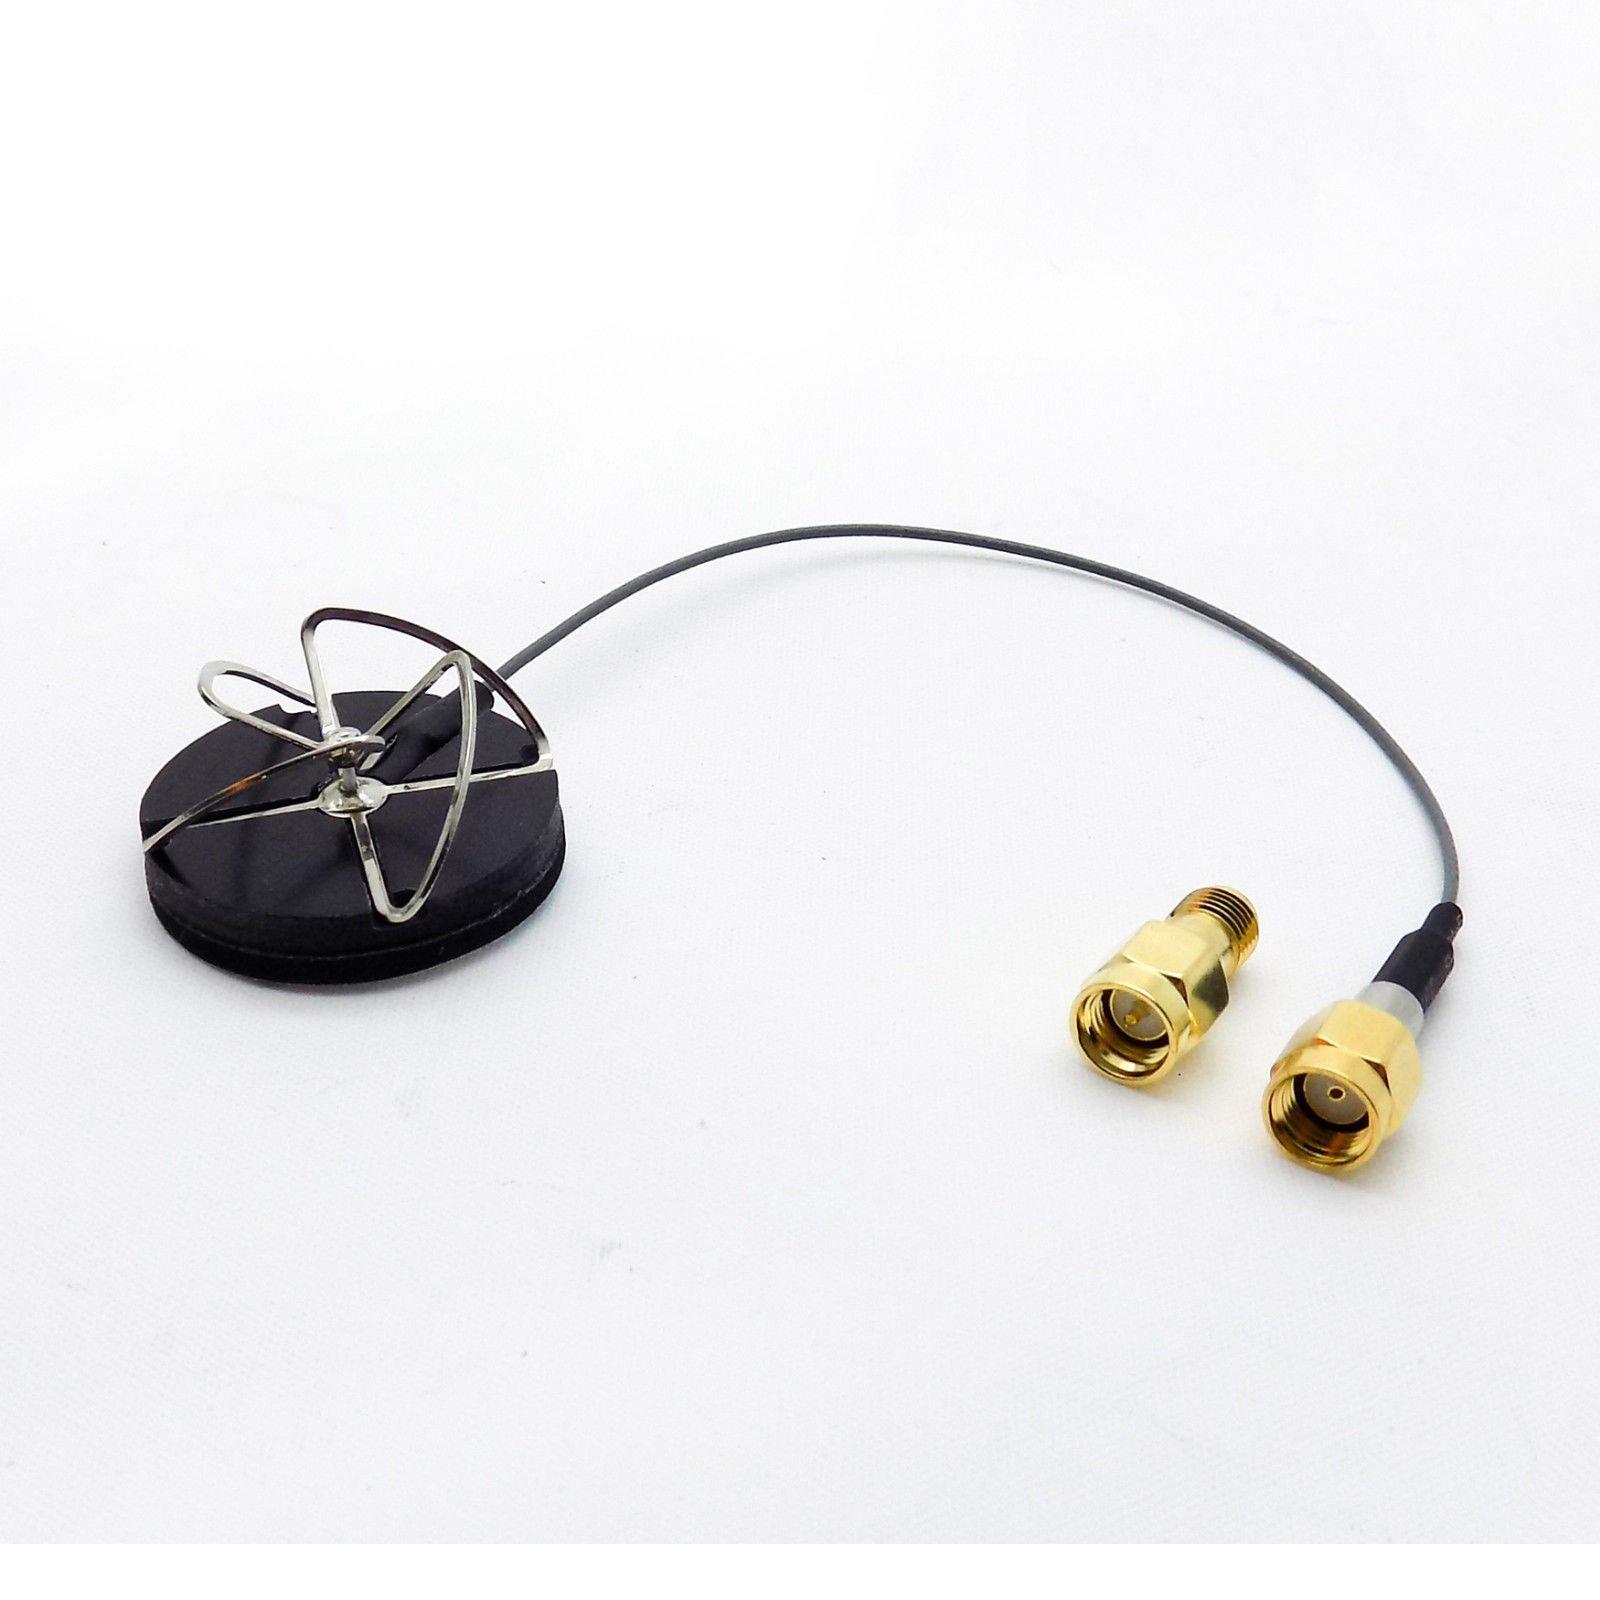 5.8 GHz Circular Polarized Antenna Set TX RX Right Angle SMA Male For DJI Flame